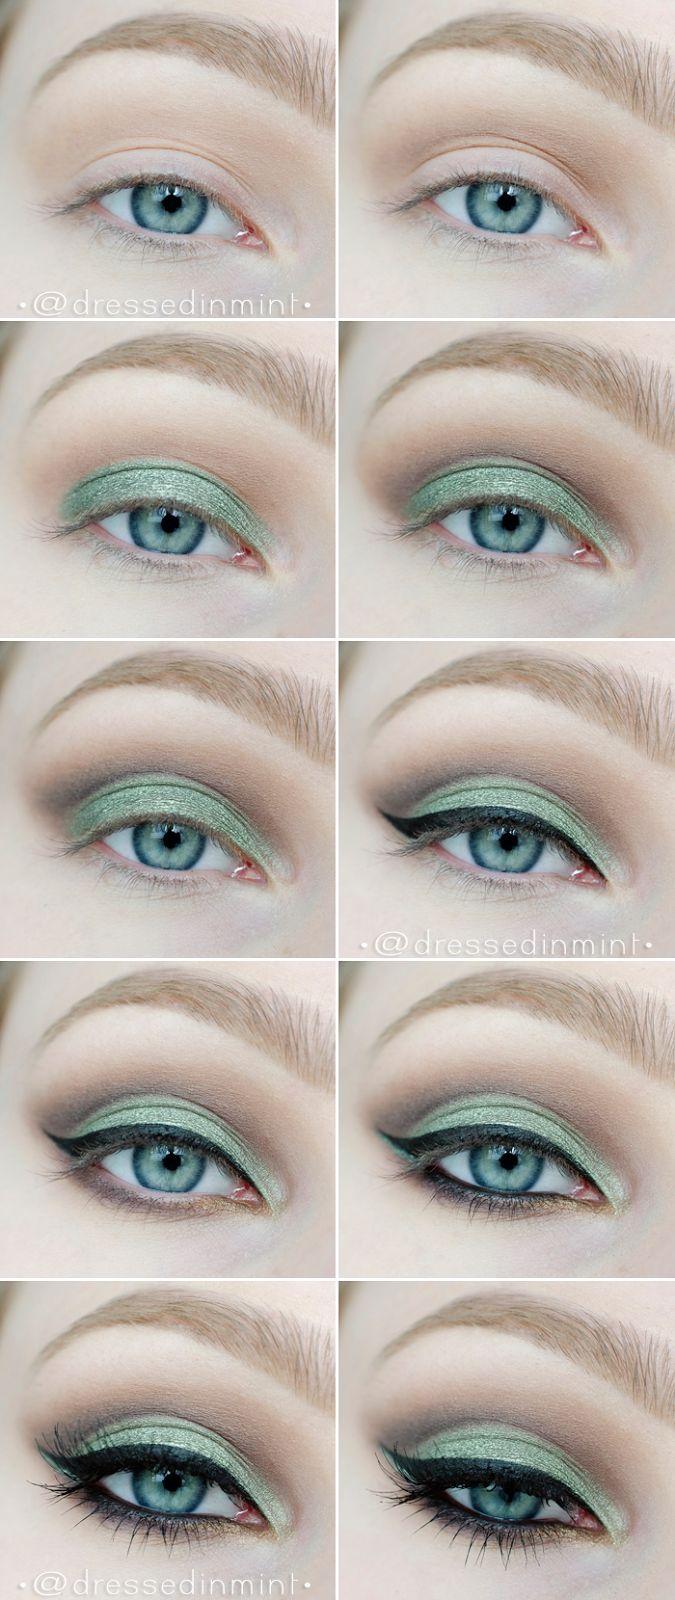 White dress eye makeup - Make Up Green Cut Crease Step By Step